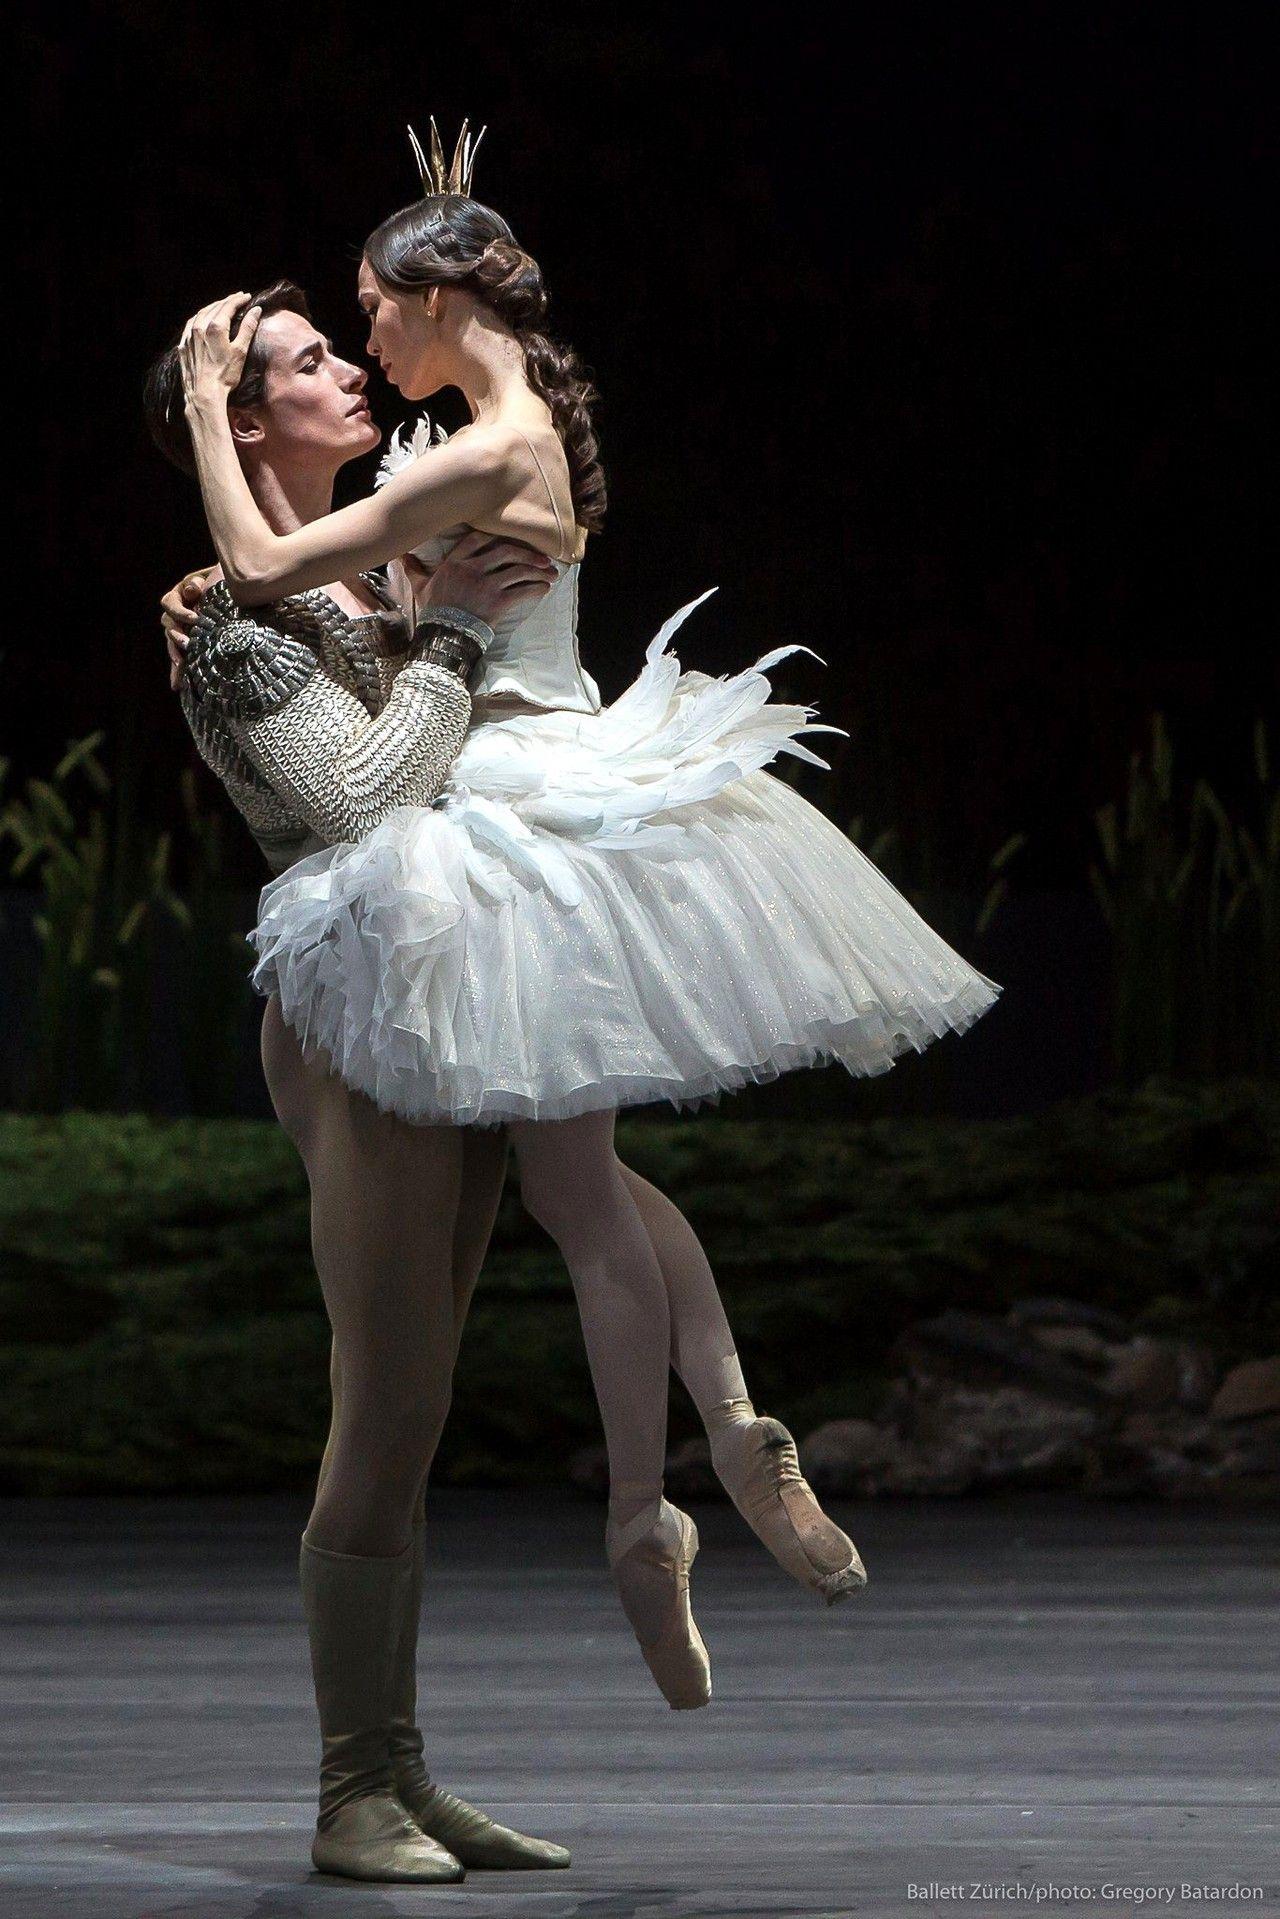 Ballerina Yevgenia Obraztsova: career, repertoire, personal life 76